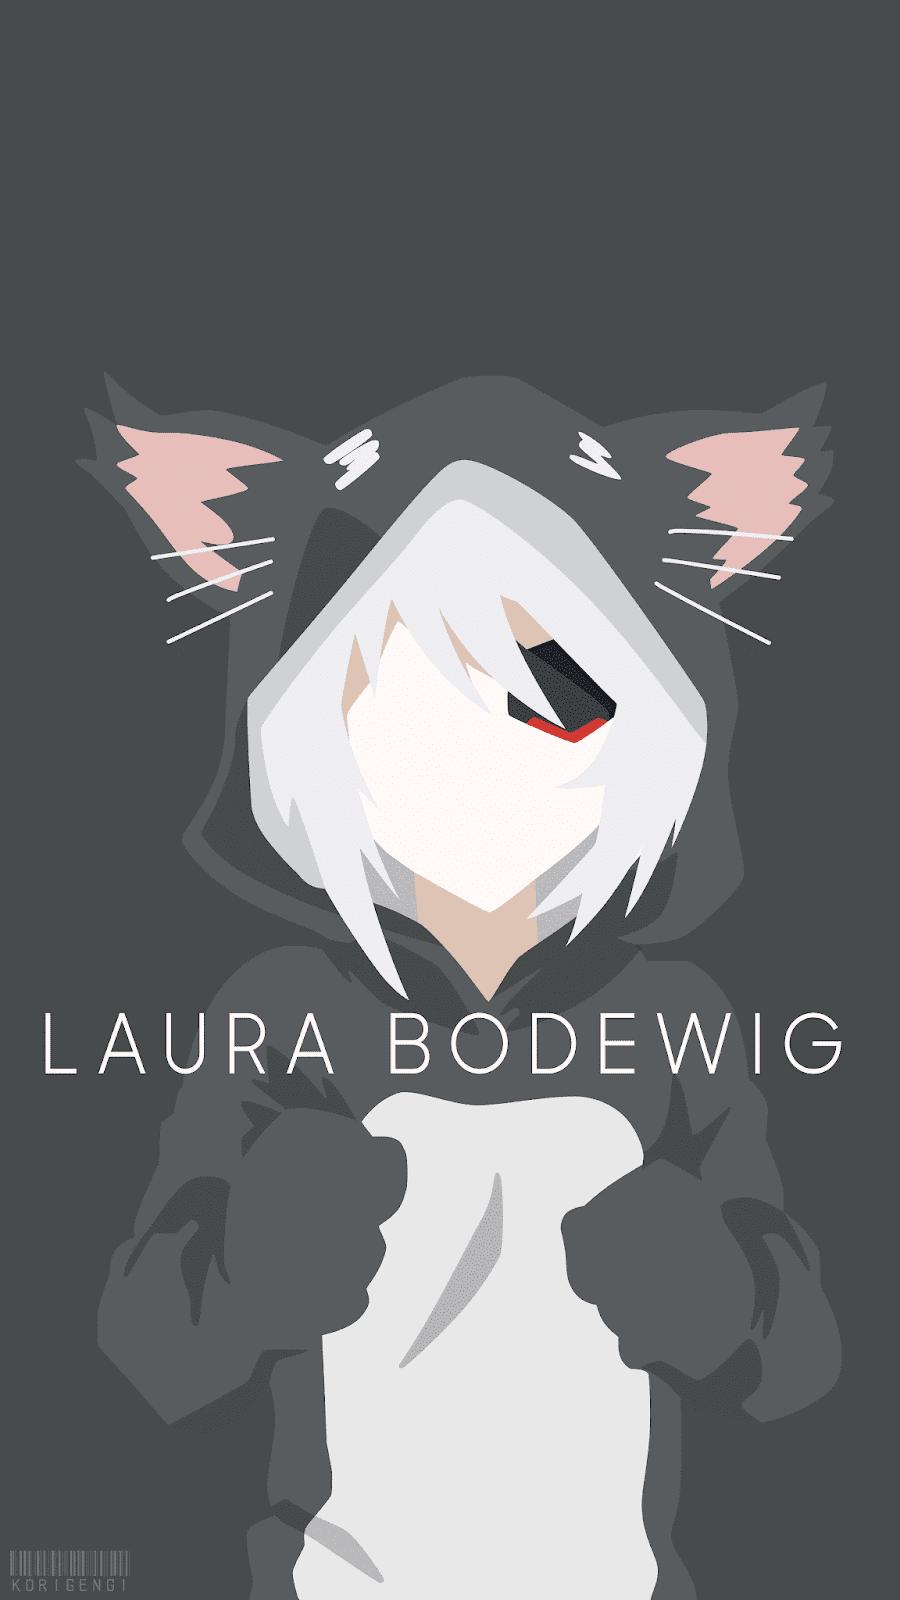 Laura Bodewig (Neko) - Infinite Stratos Wallpaper